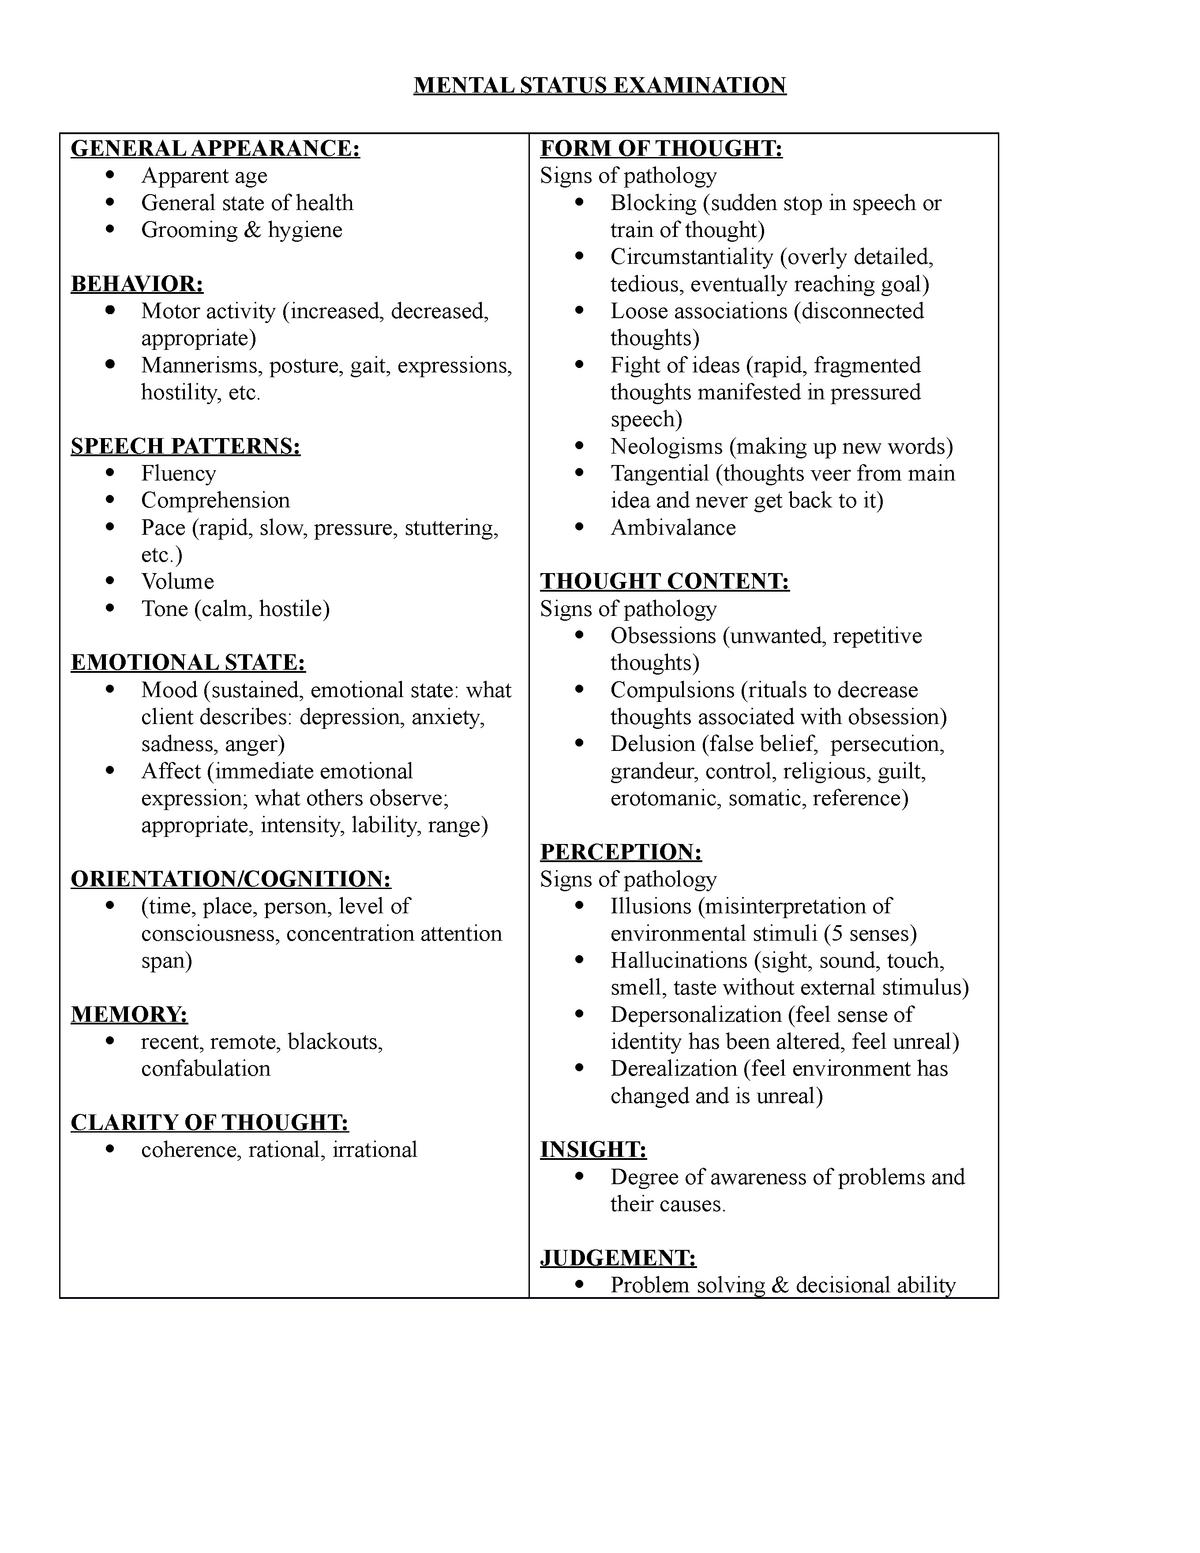 Mental Status Exam - Grade: B+ - Pronunciation Workshop B ...